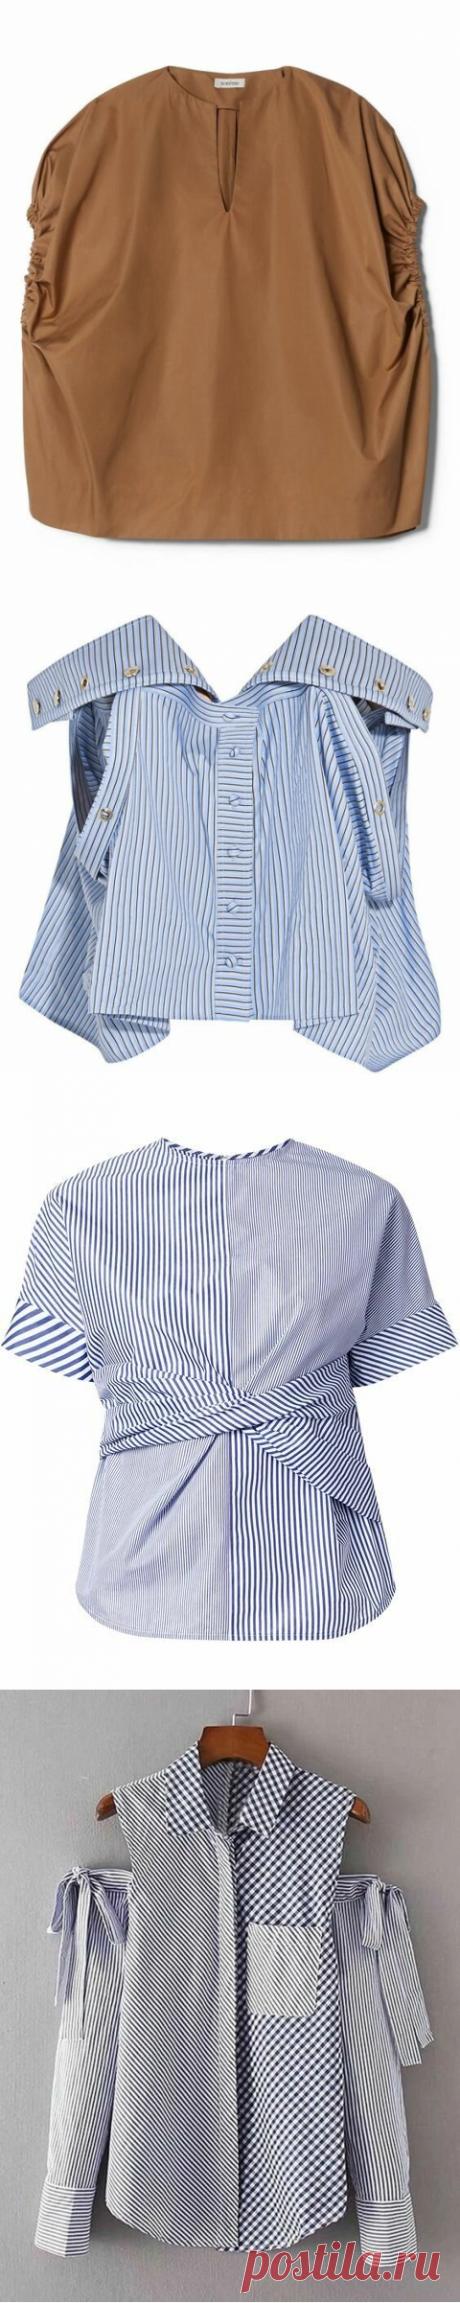 Стильная подборка необычных блузок- рубашек | МАТРИЦА МОДЫ | Яндекс Дзен